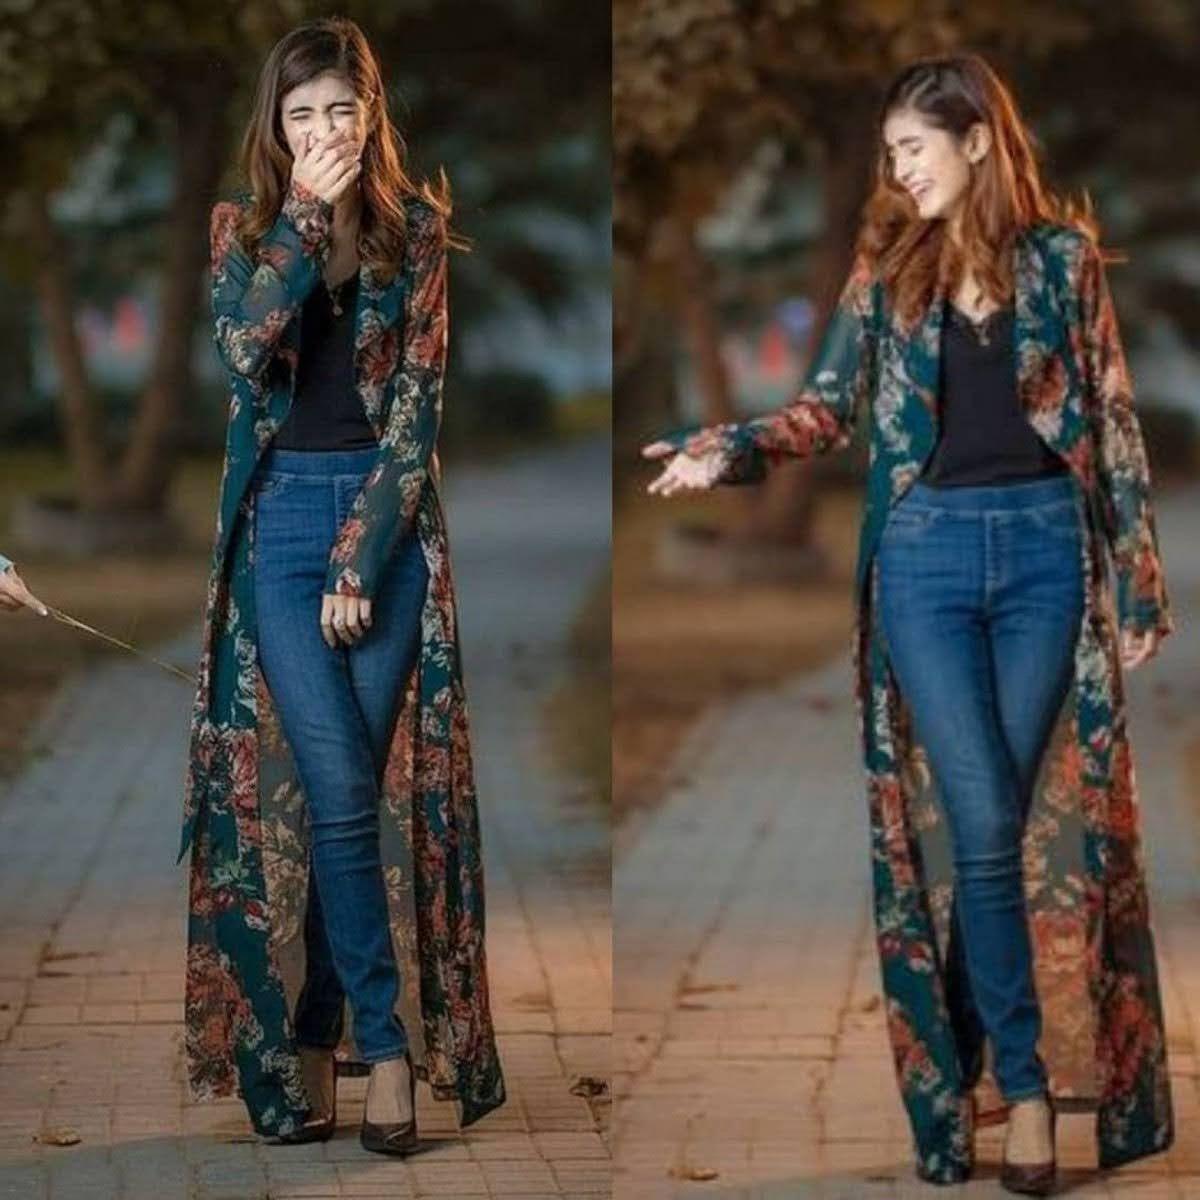 Pin By Mew Sugar On Chai Masala In 2021 Fashion Western Wear Outfits Long Shrug [ 1200 x 1200 Pixel ]